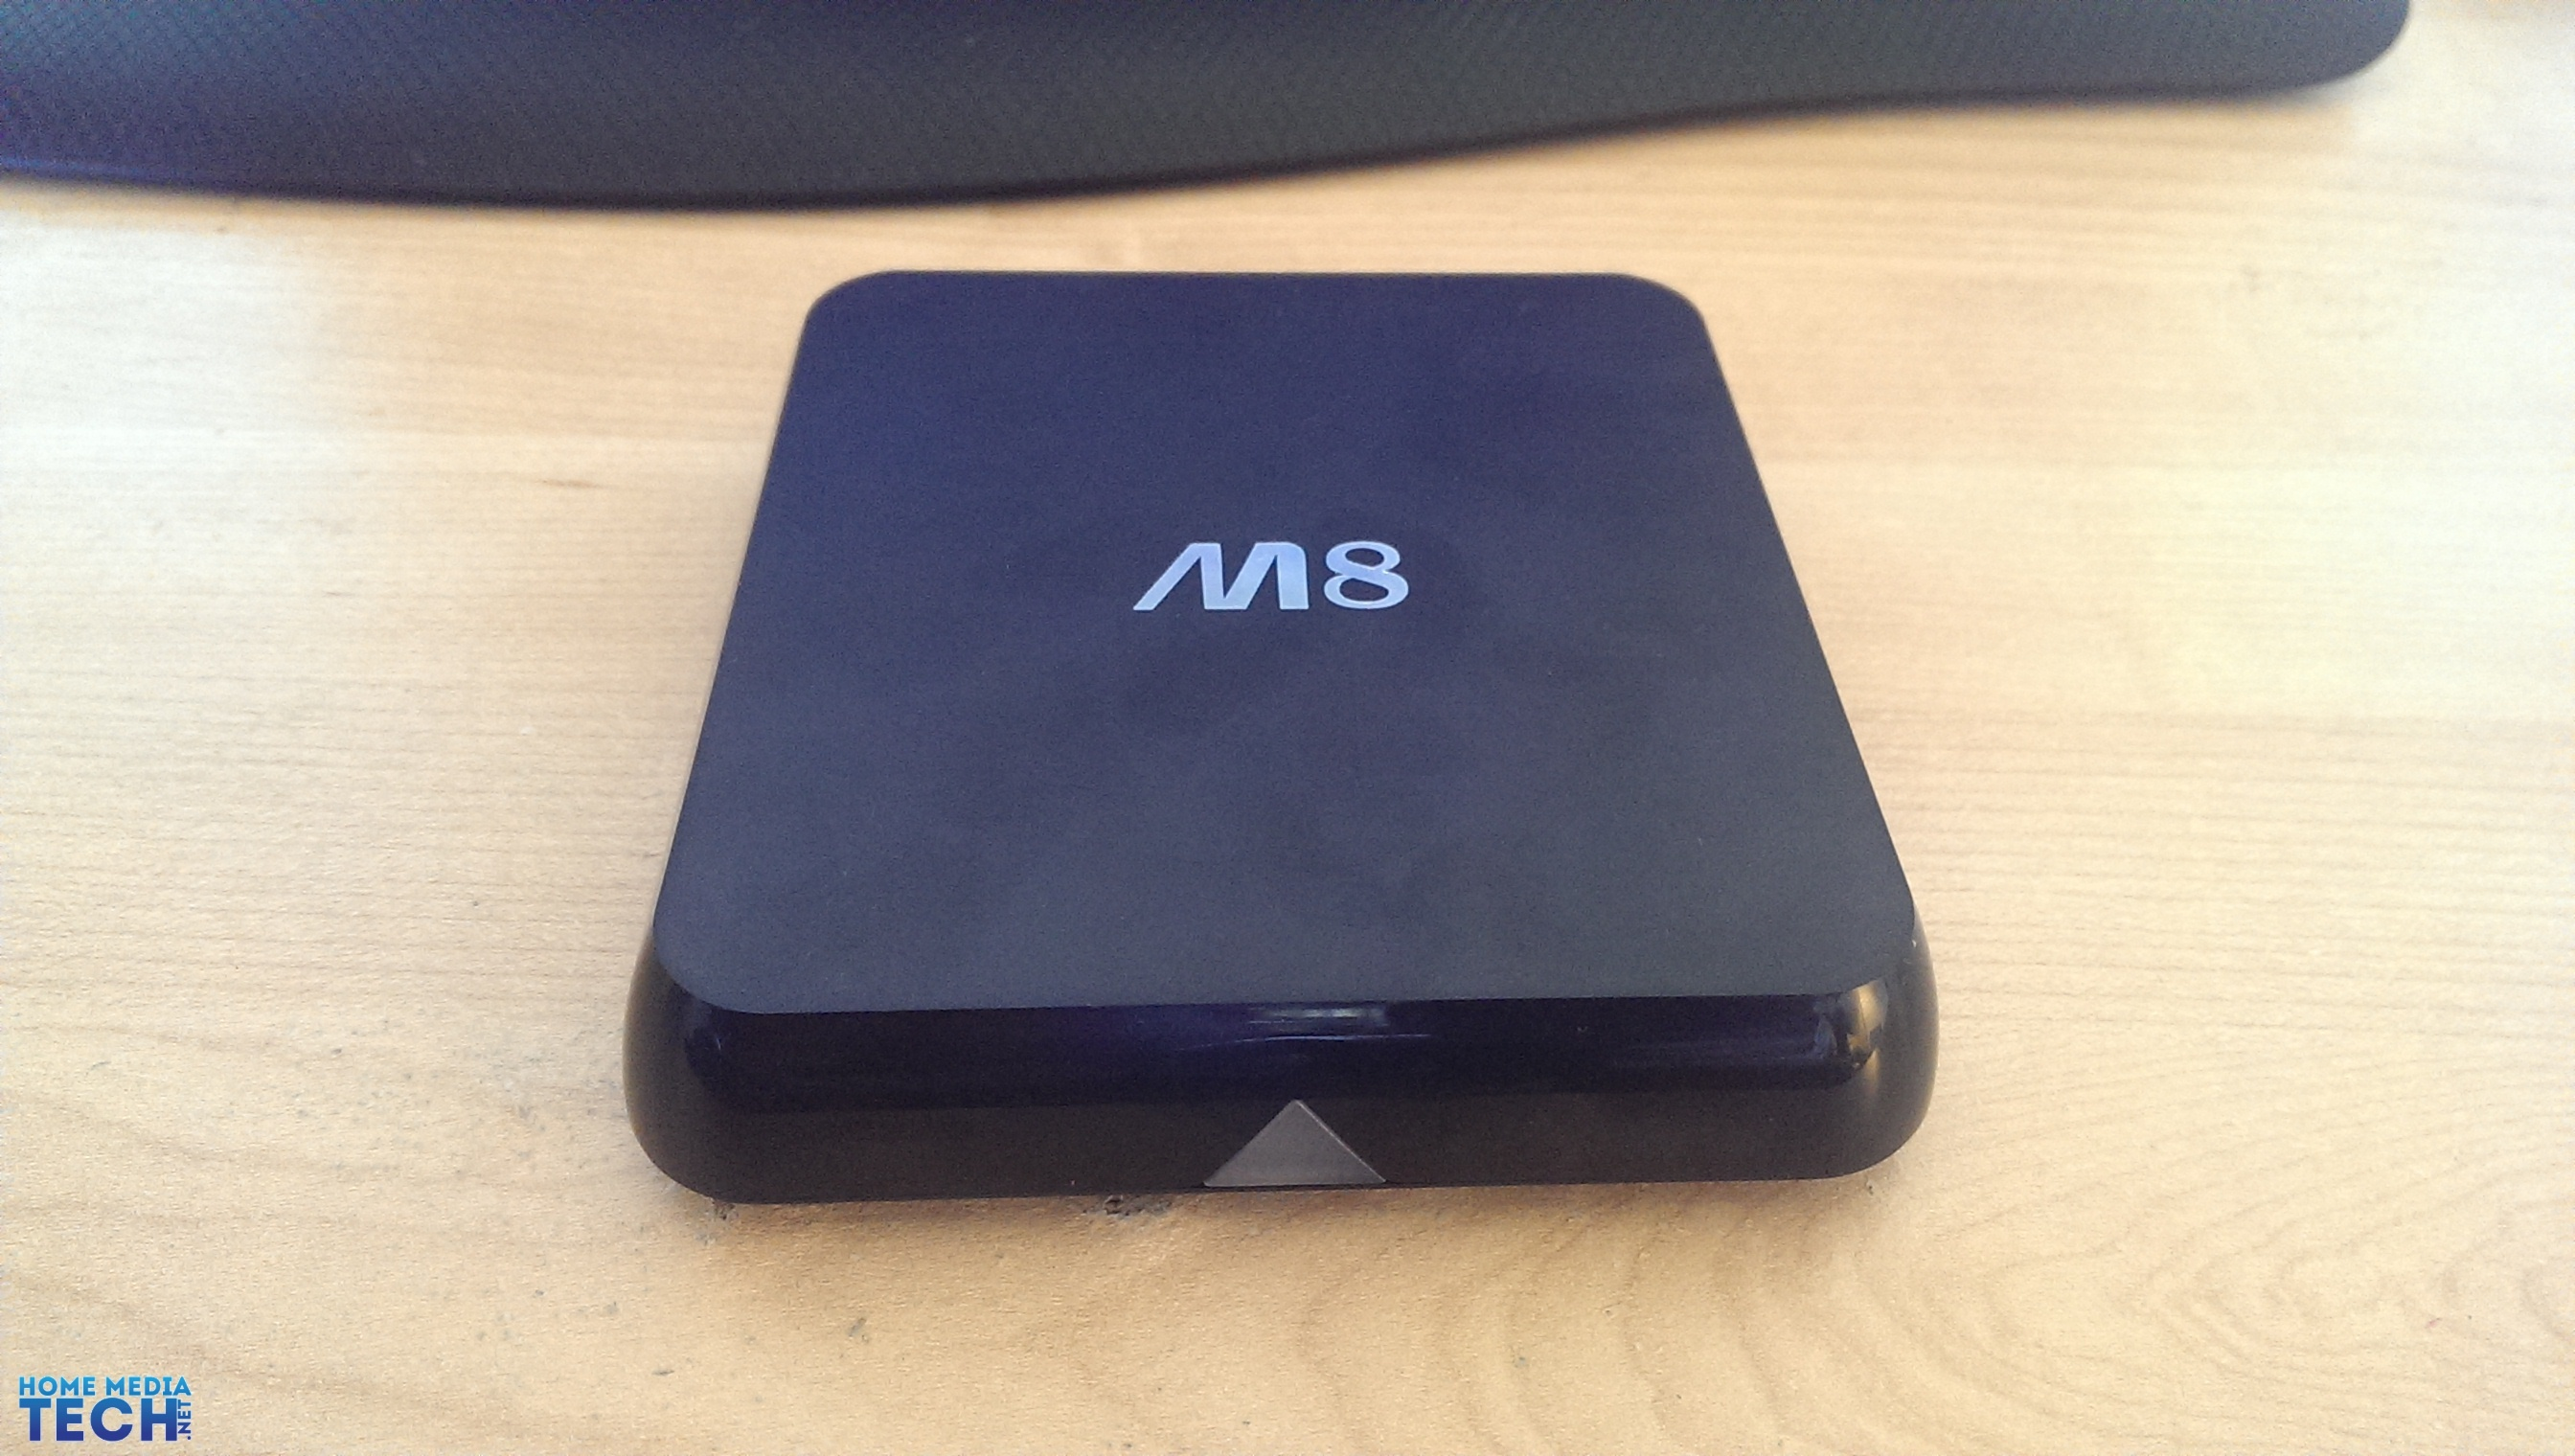 Android M8 Quad Core Mini PC TV Box 5